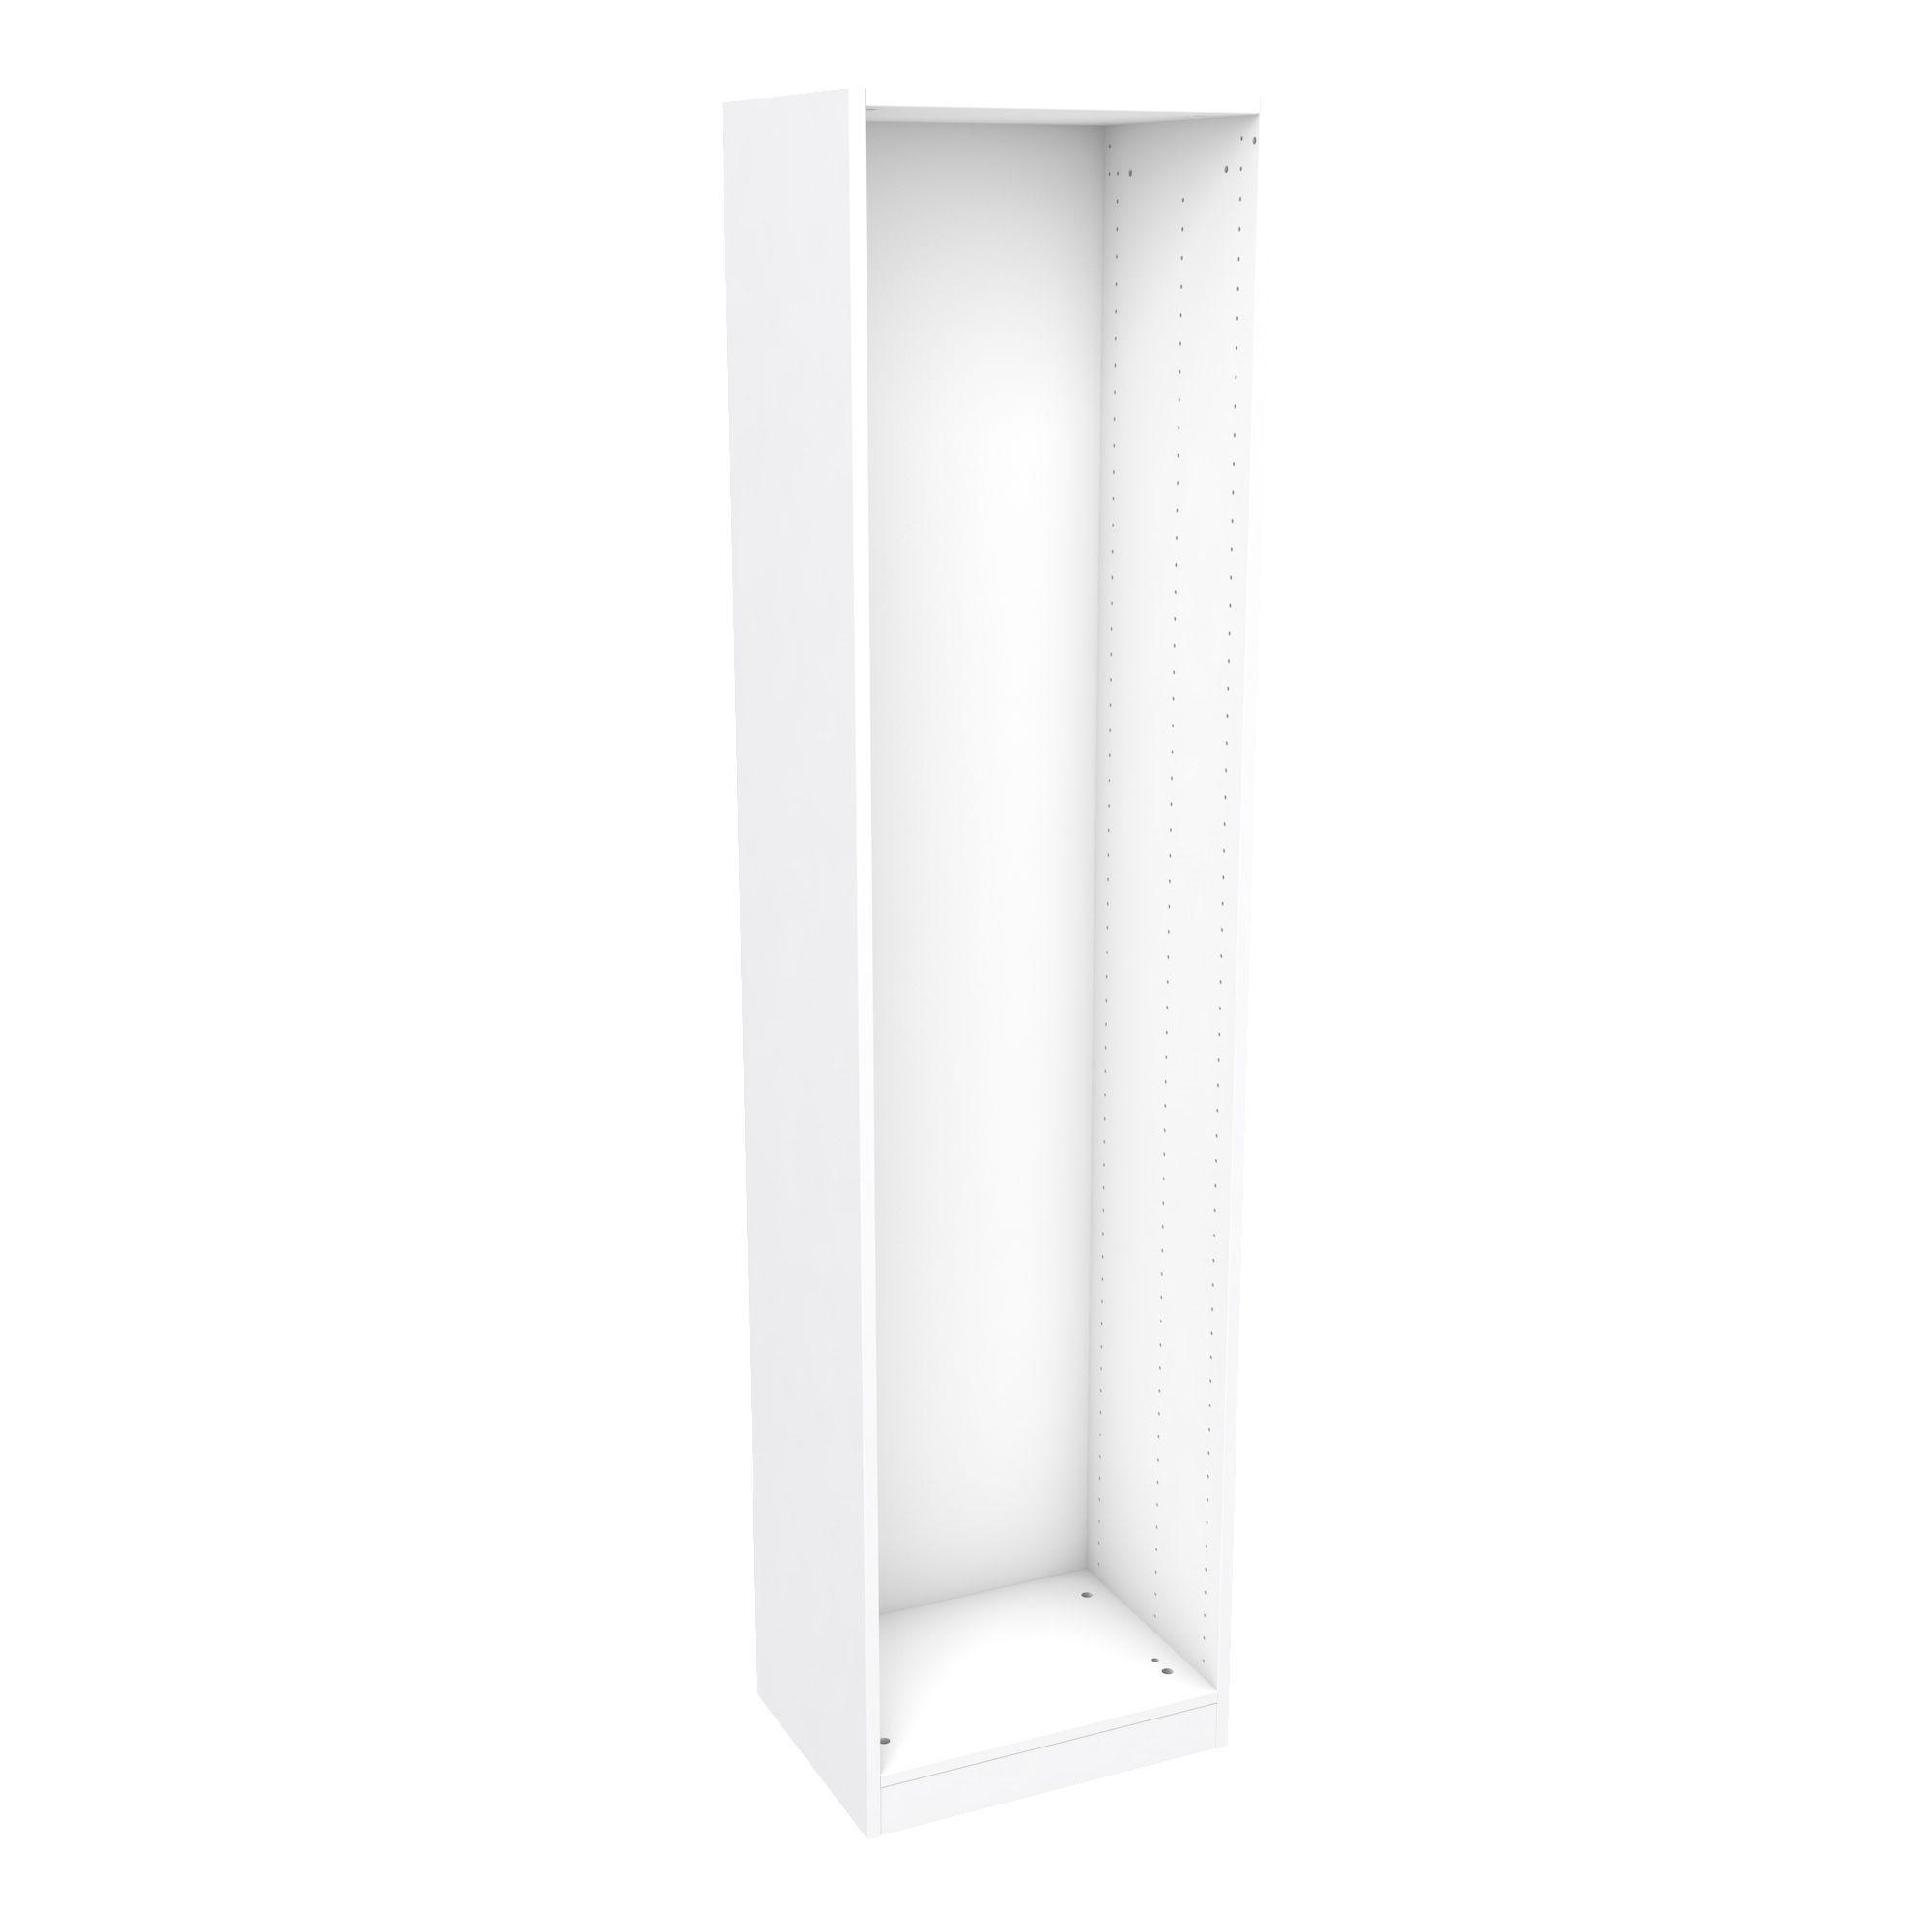 Darwin Modular White Wardrobe Cabinet (h)2004mm (w)500mm (d)374mm